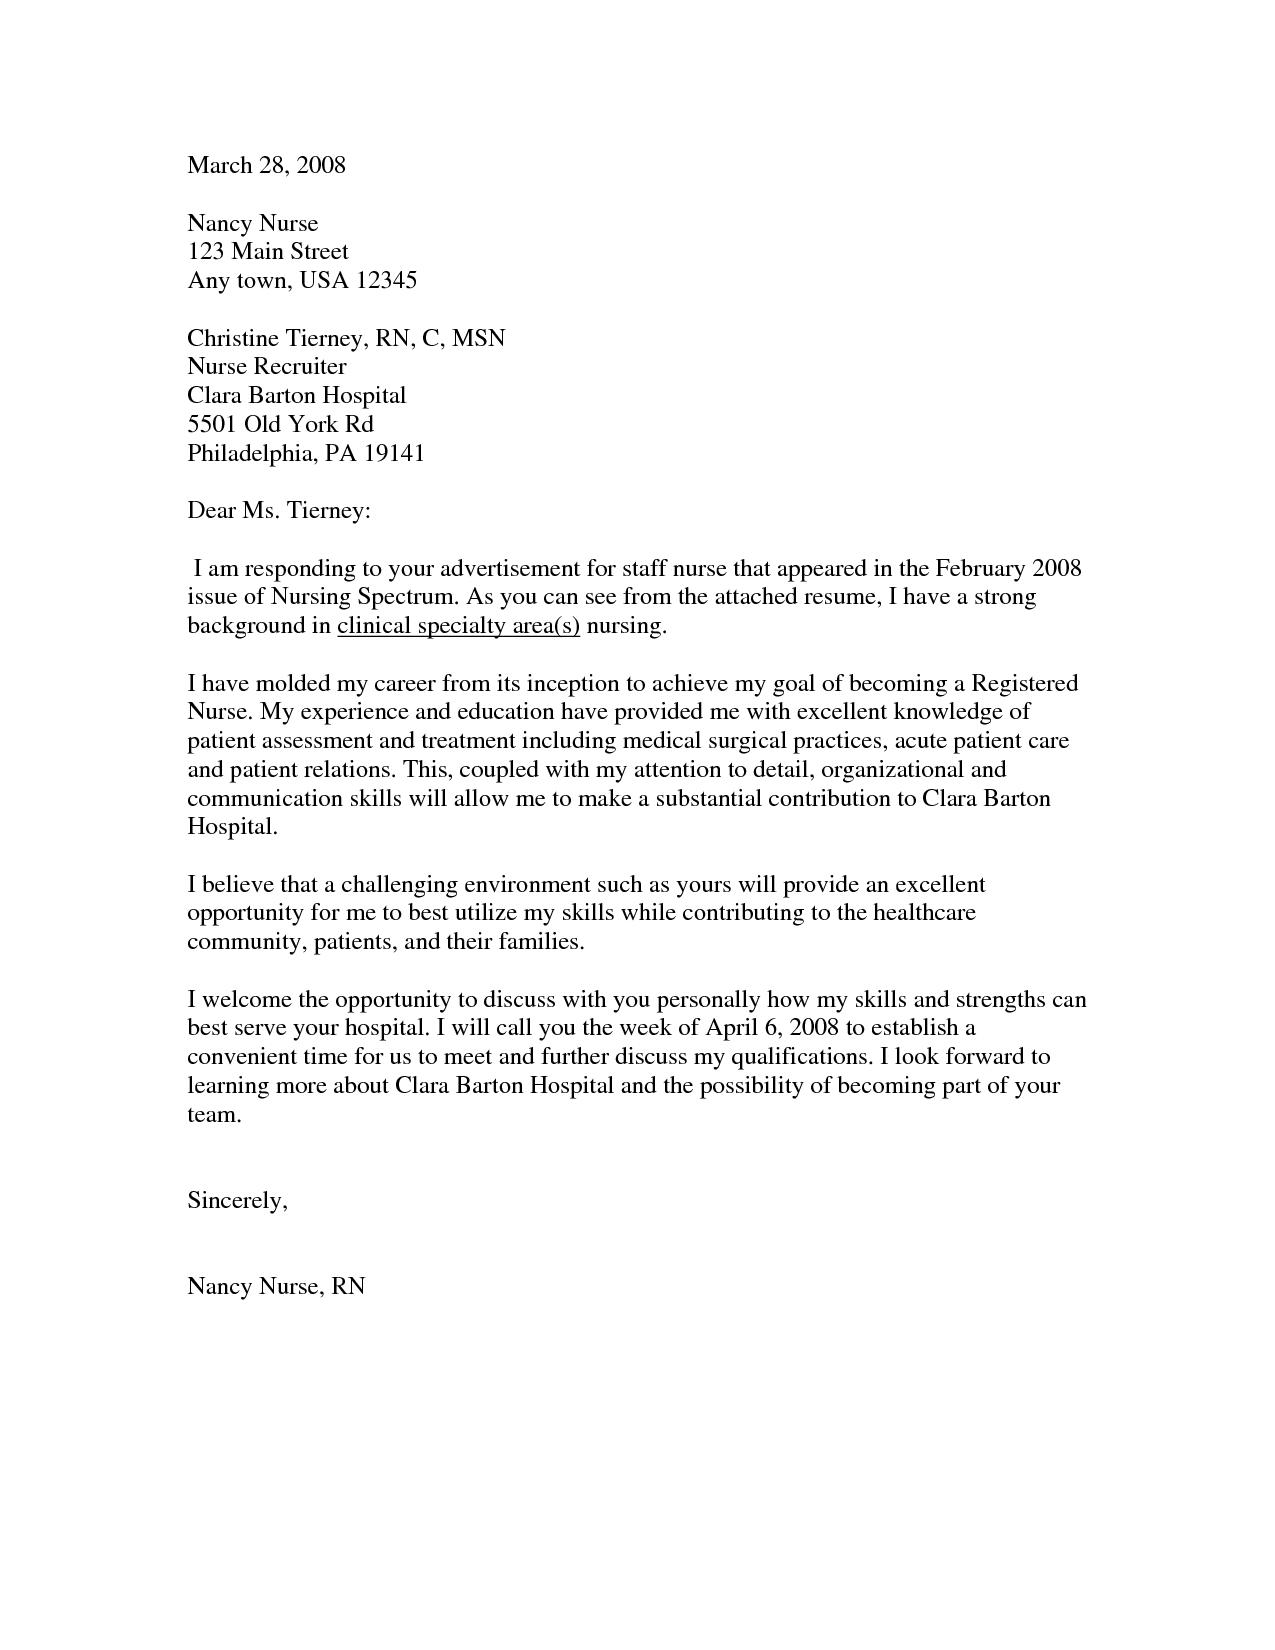 Cover Letter Template Nurse Practitioner Cover Coverlettertemplate Letter Nurse Practitio Cover Letter For Resume Job Cover Letter Nursing Cover Letter